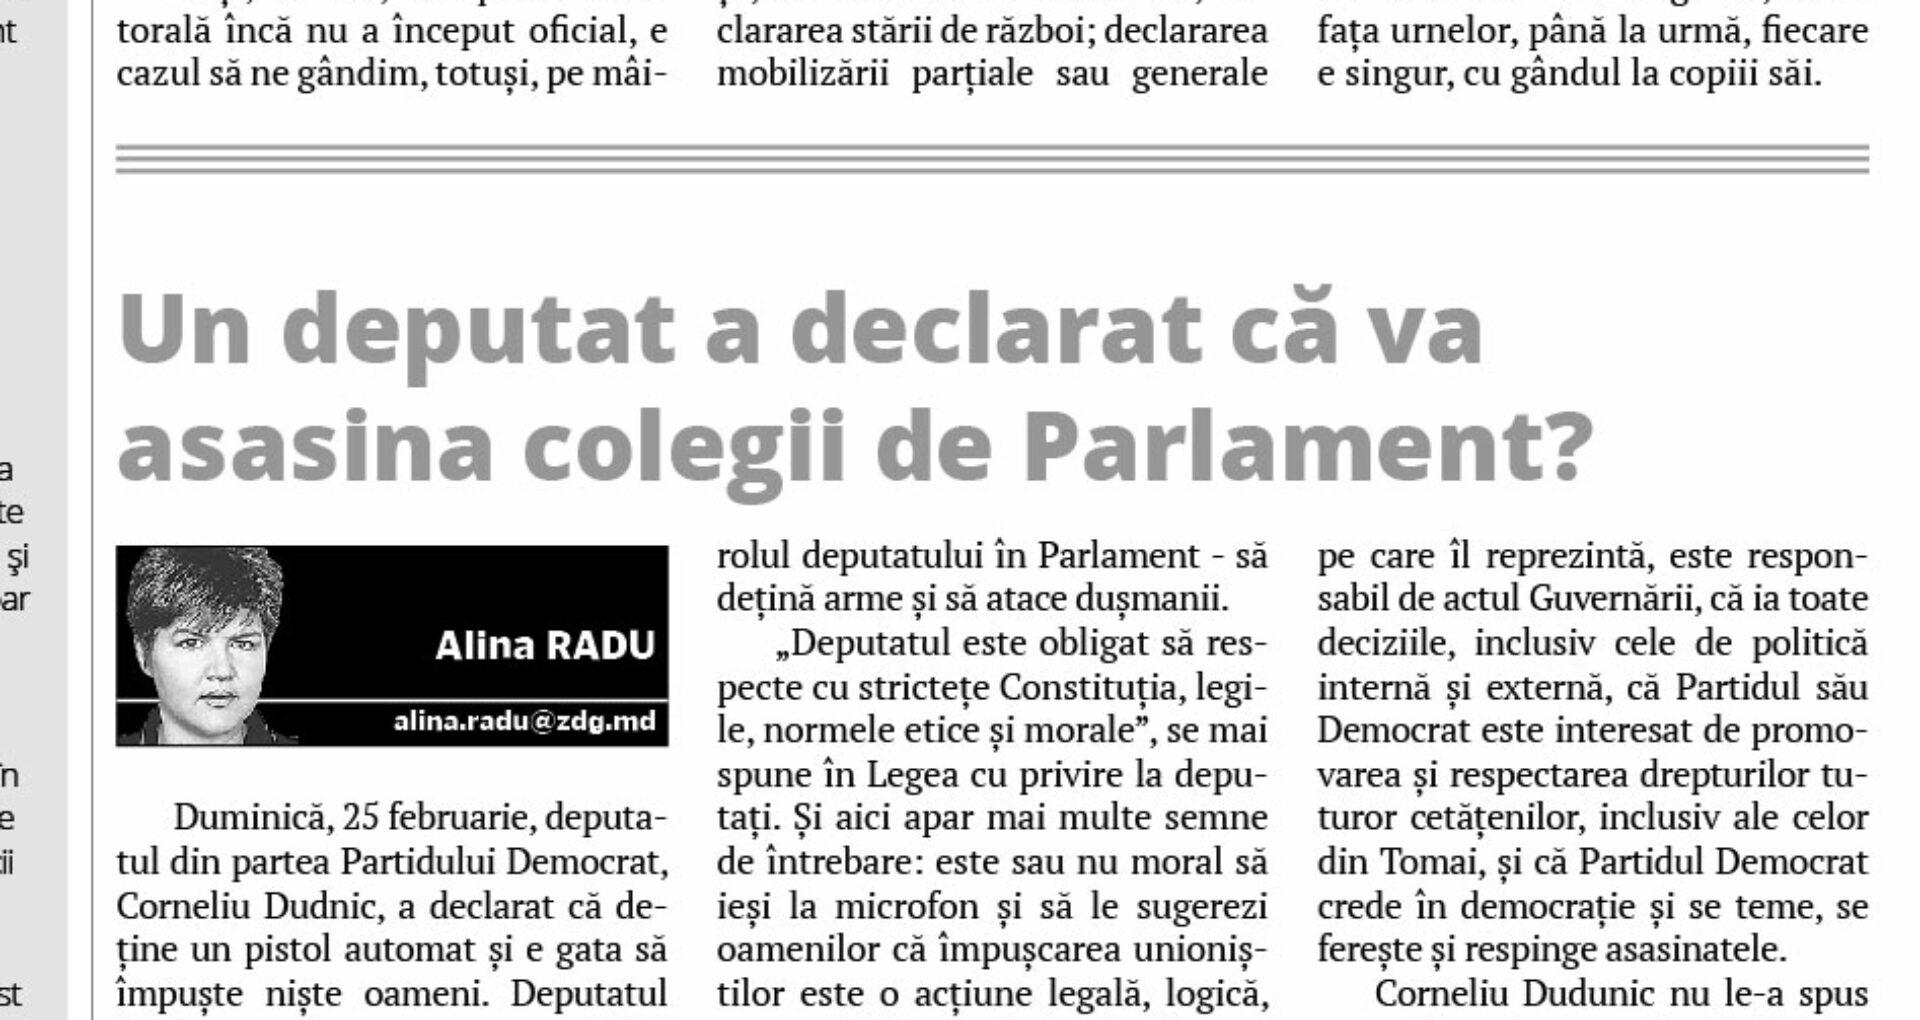 Un deputat a declarat că va asasina colegii de Parlament?